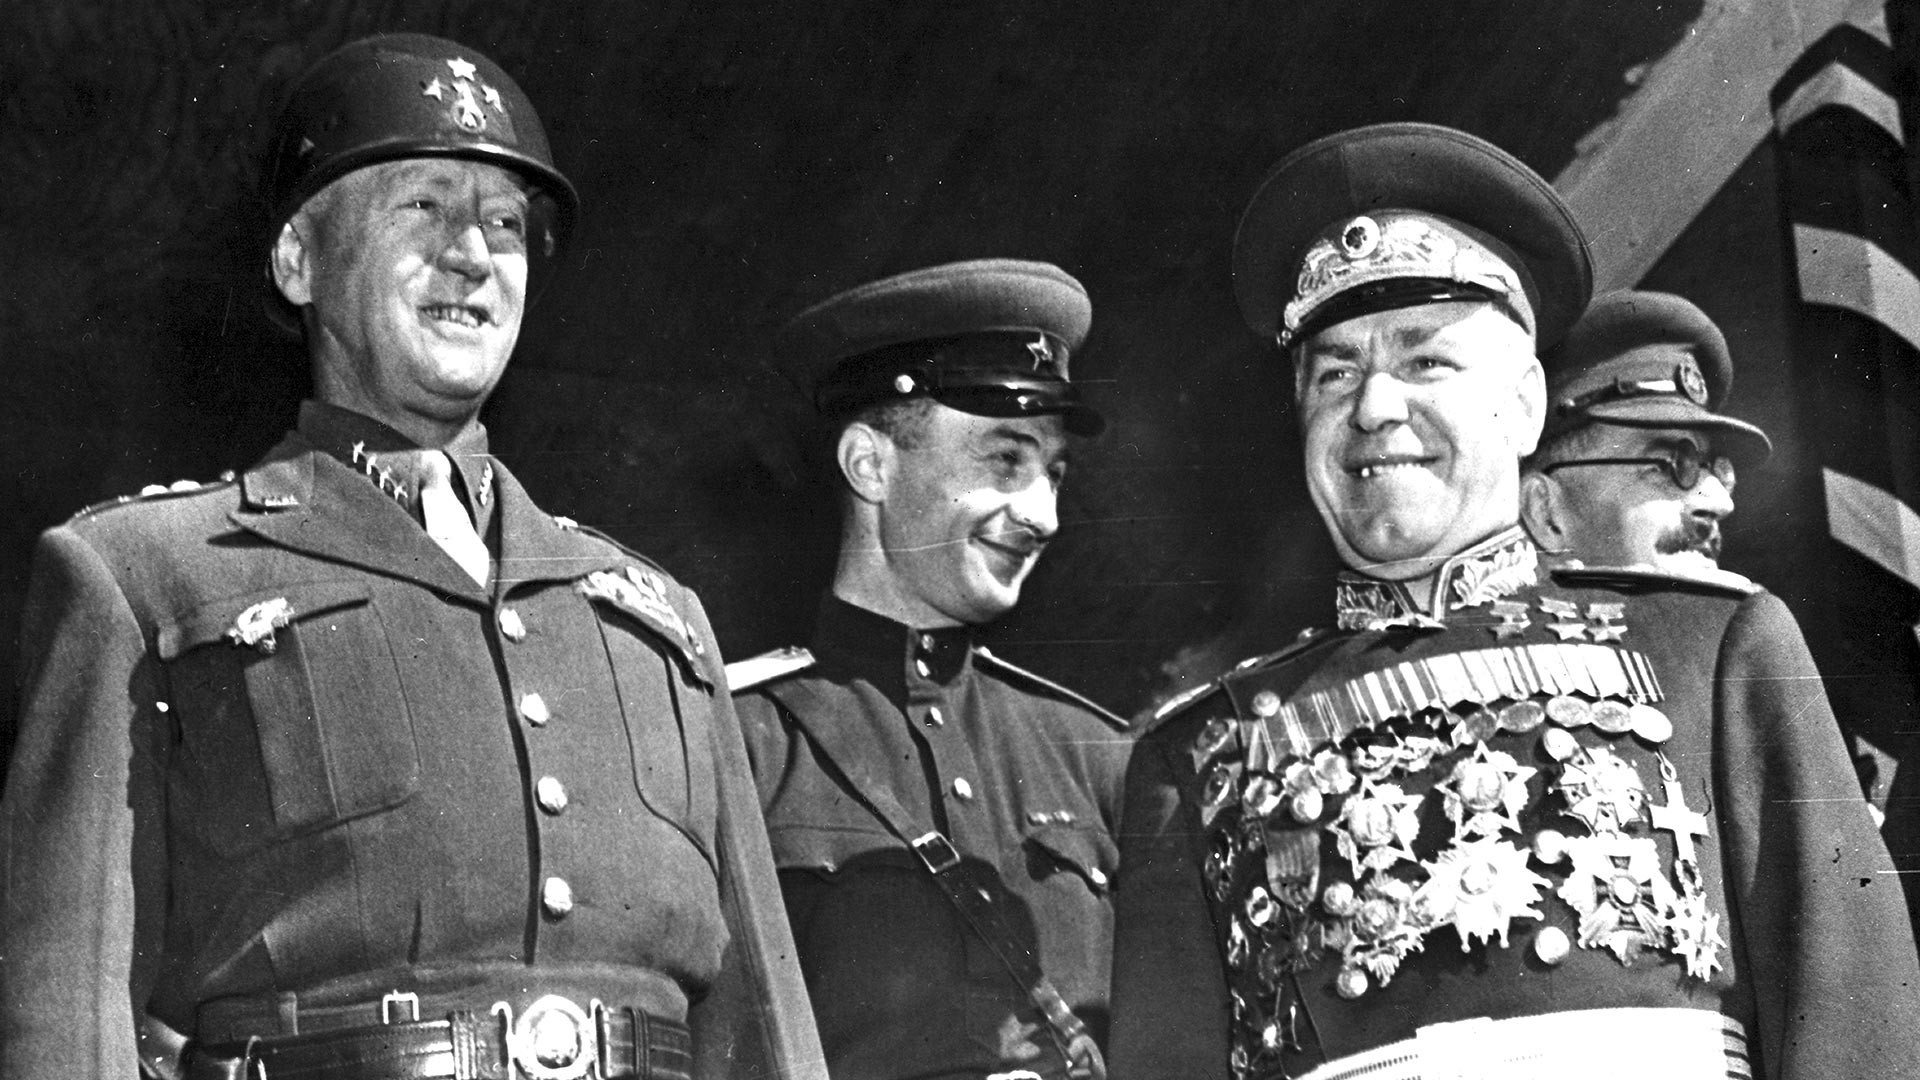 George S. Patton e Jukov no desfile de 7 de setembro